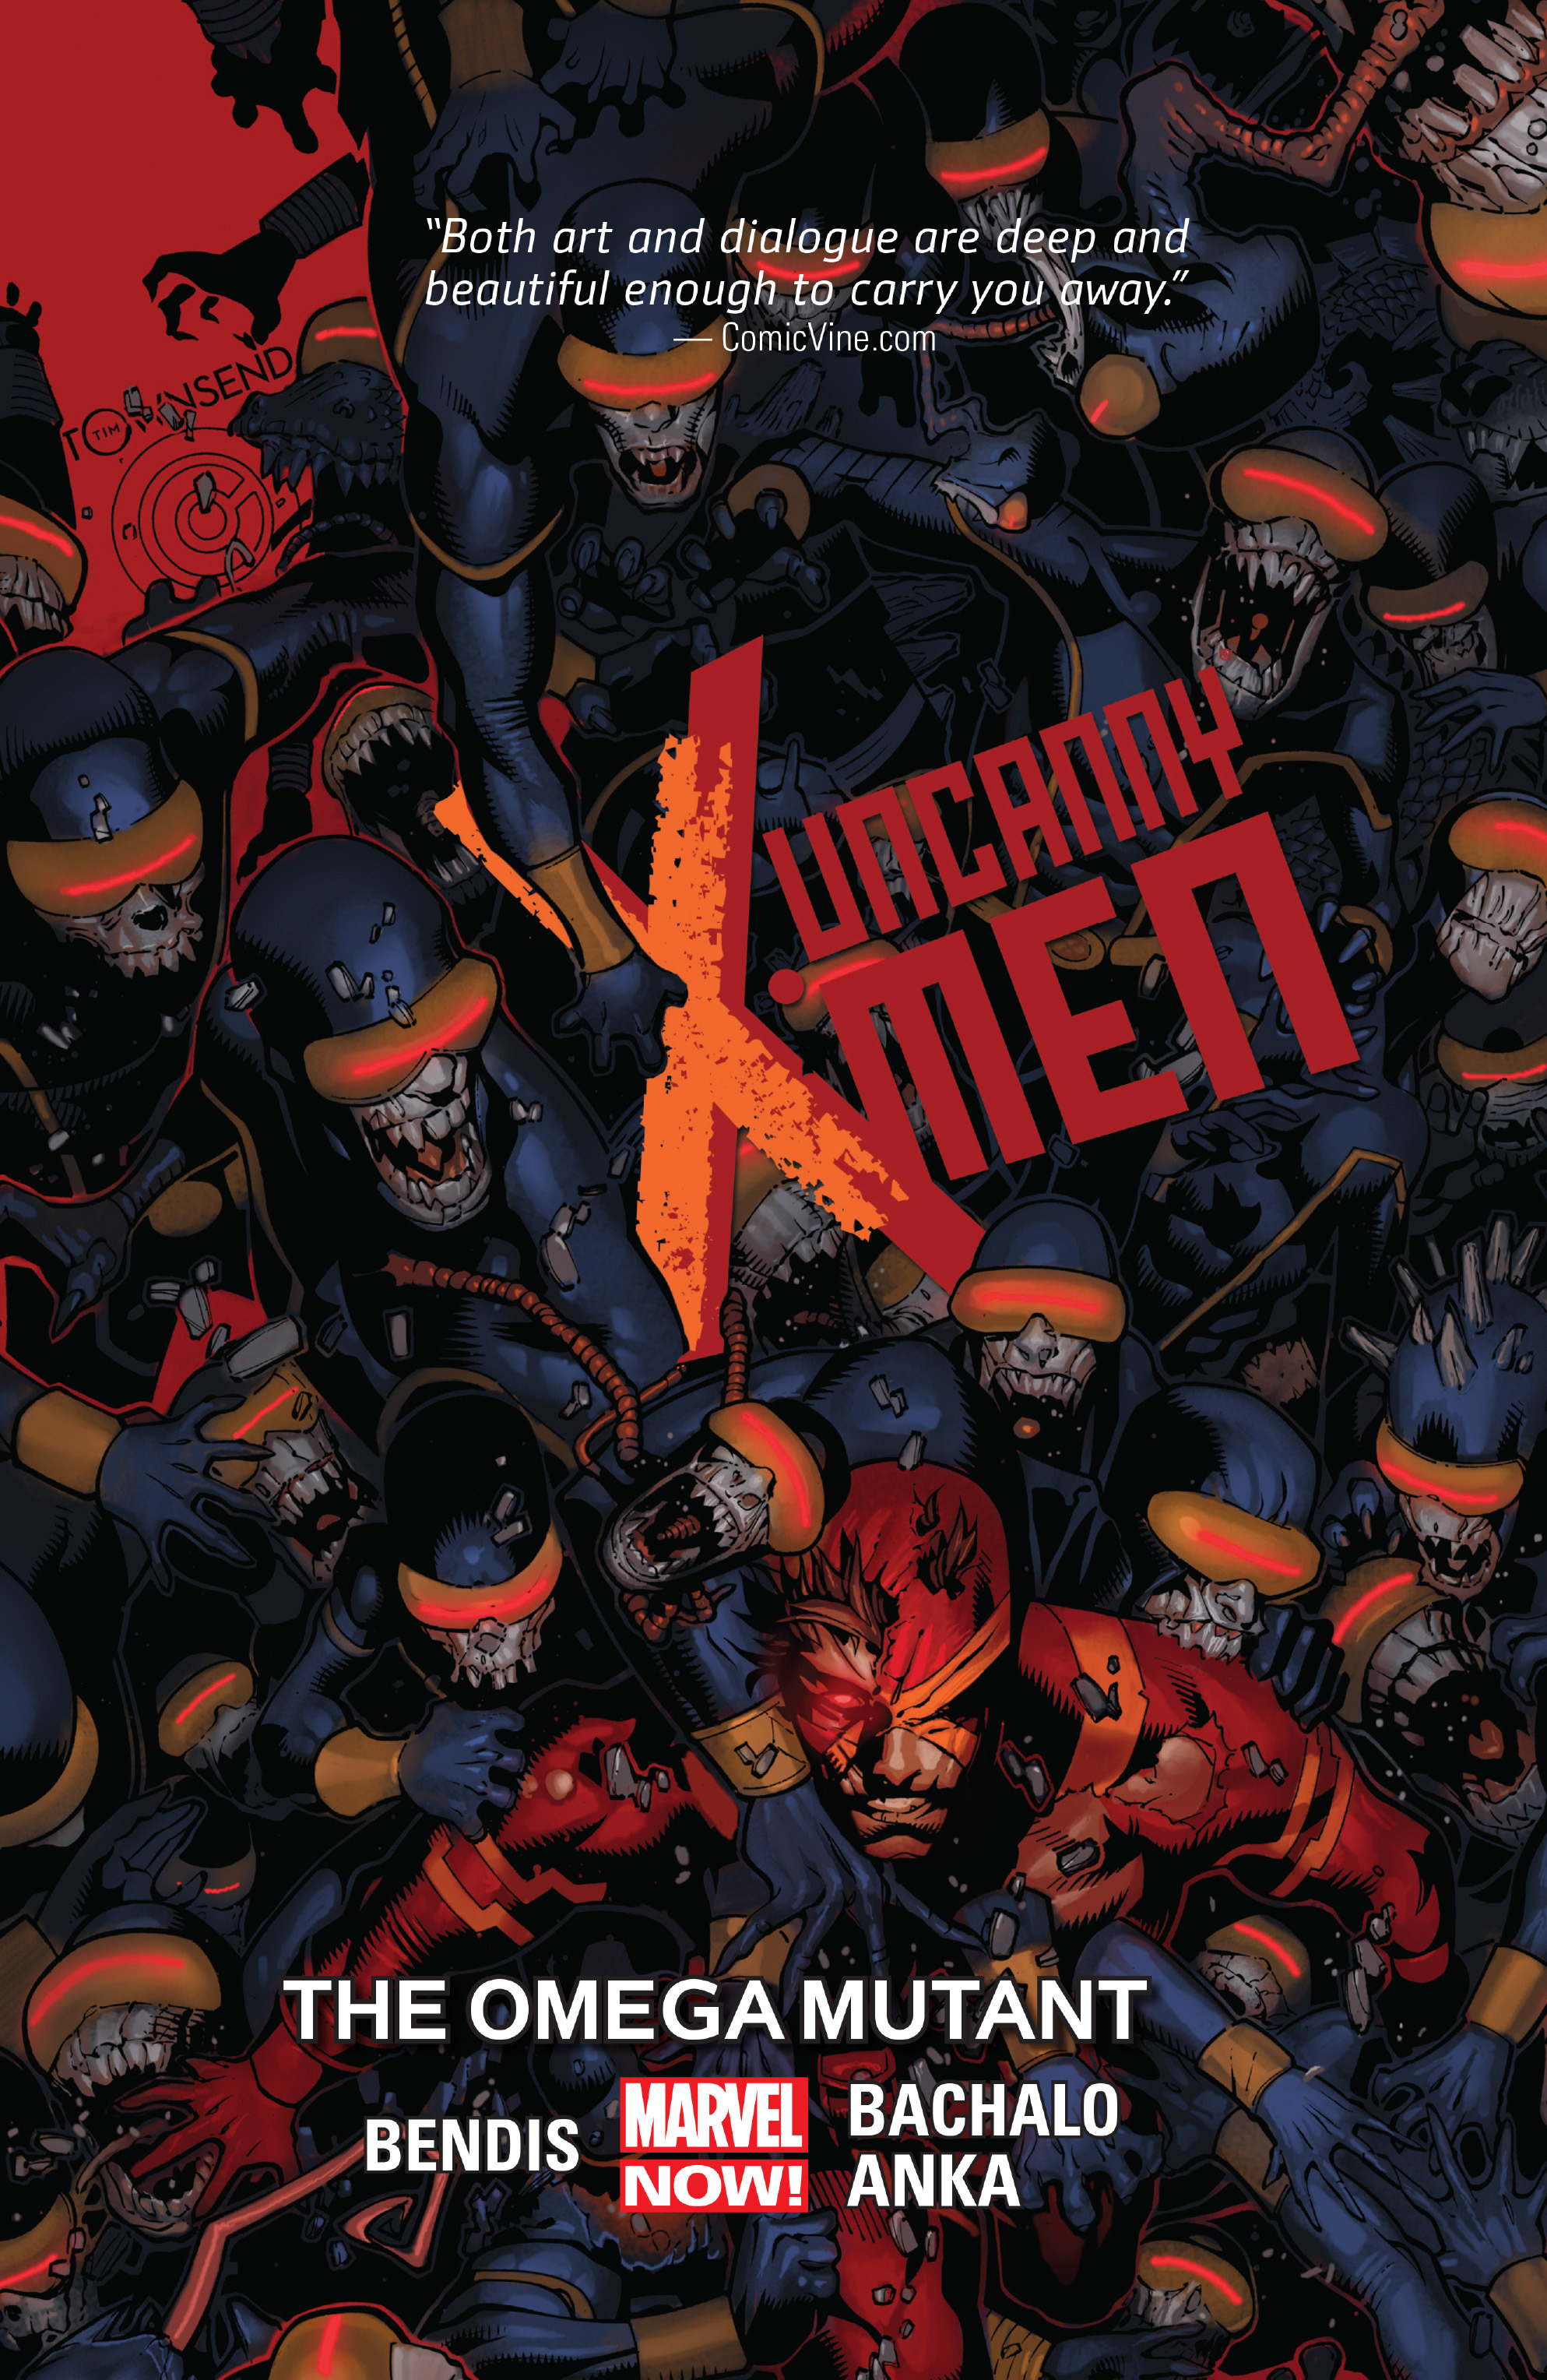 Read online Uncanny X-Men (2013) comic -  Issue # _TPB 5 - The Omega Mutant - 1